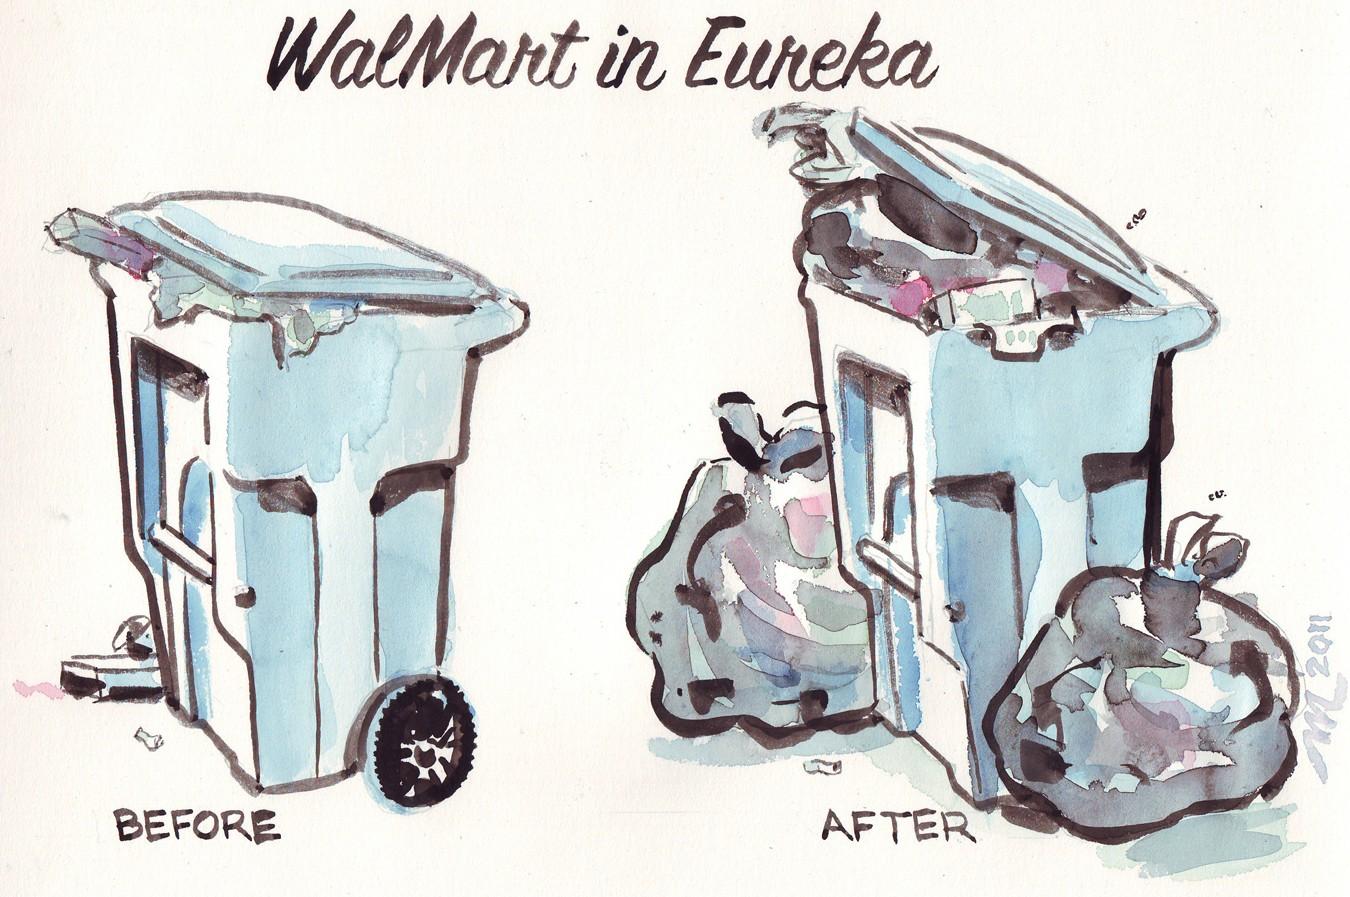 Walmart in Eureka - CARTOON BY JOEL MILEKE